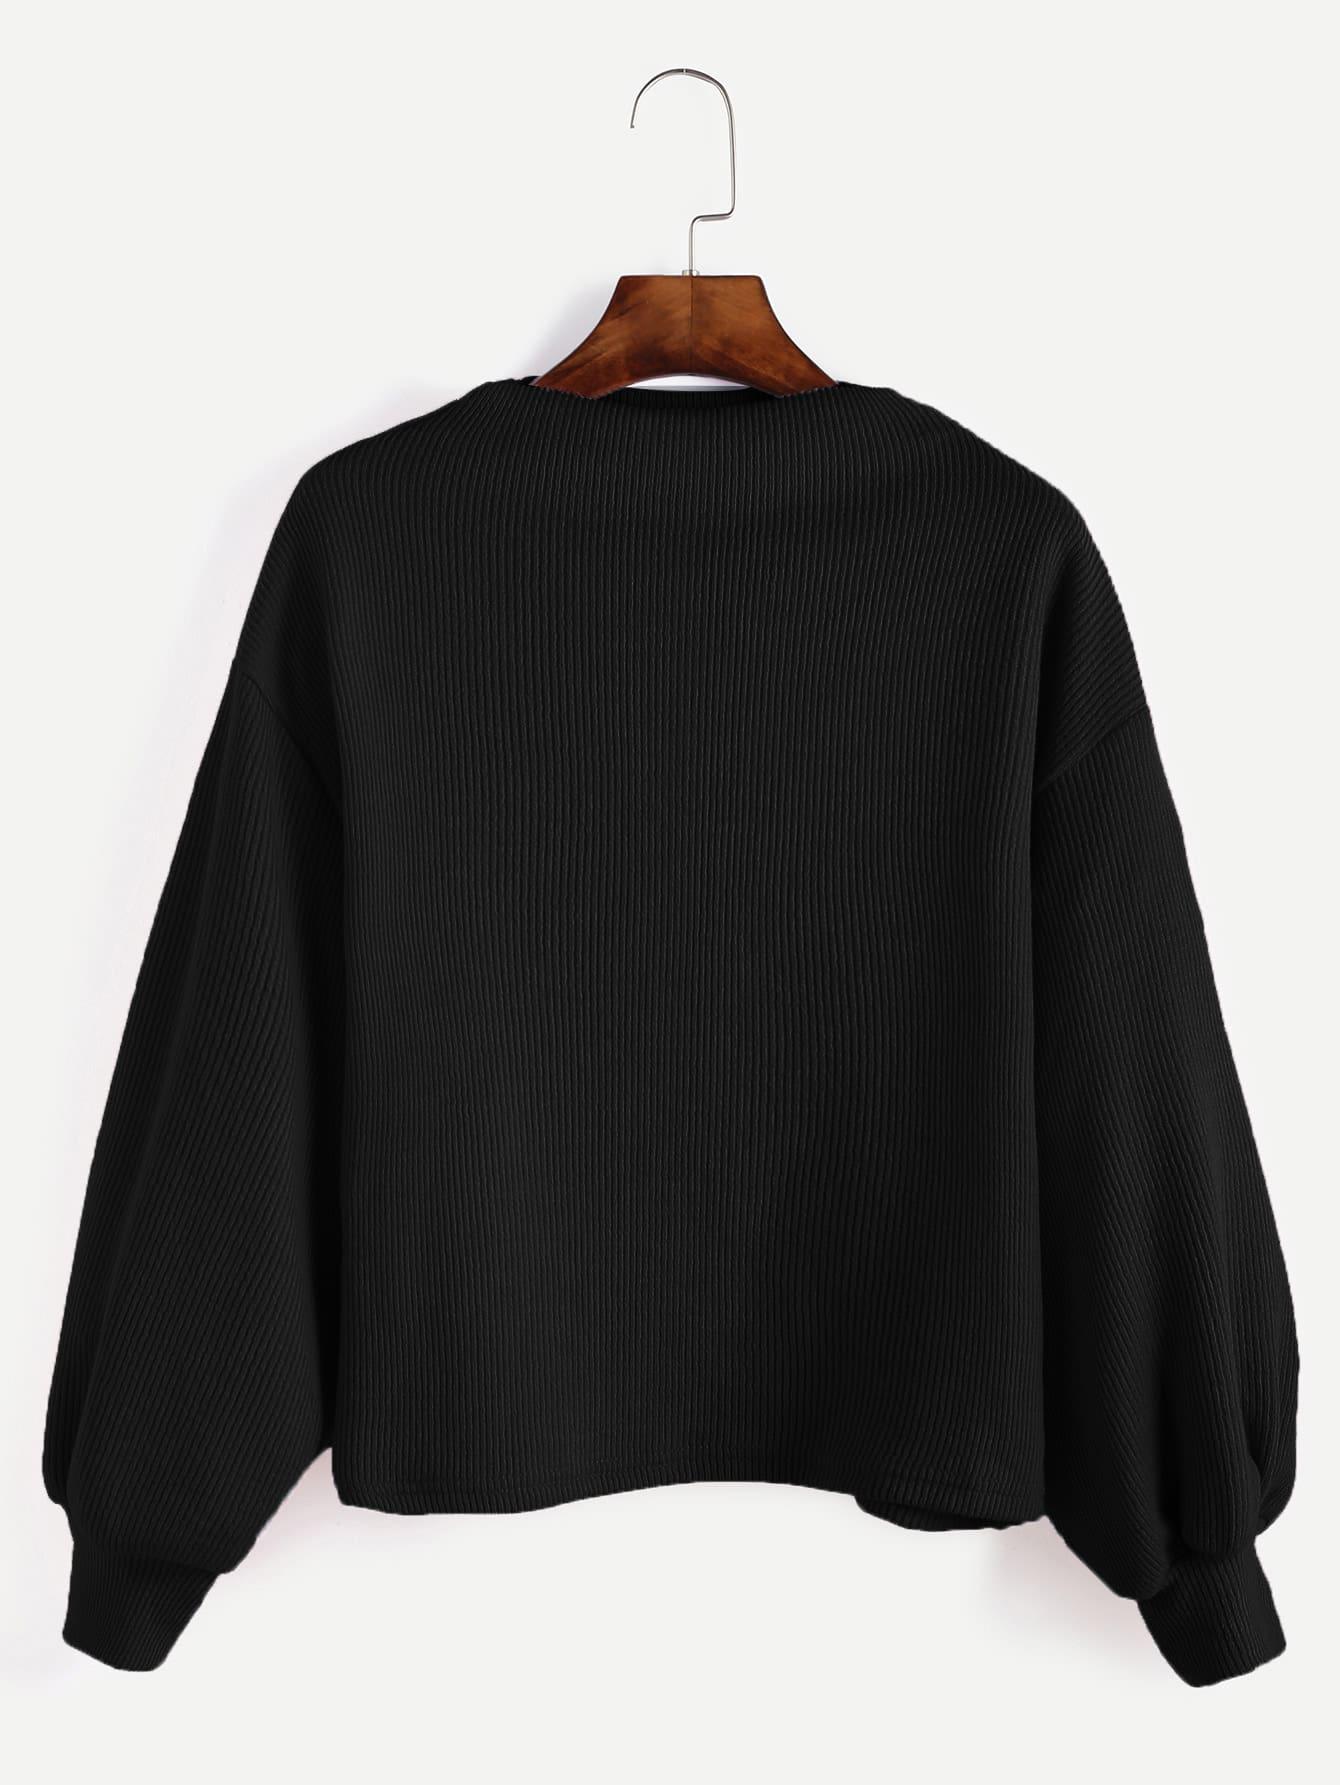 Black Ribbed Lantern Sleeve Sweater sweater161017004